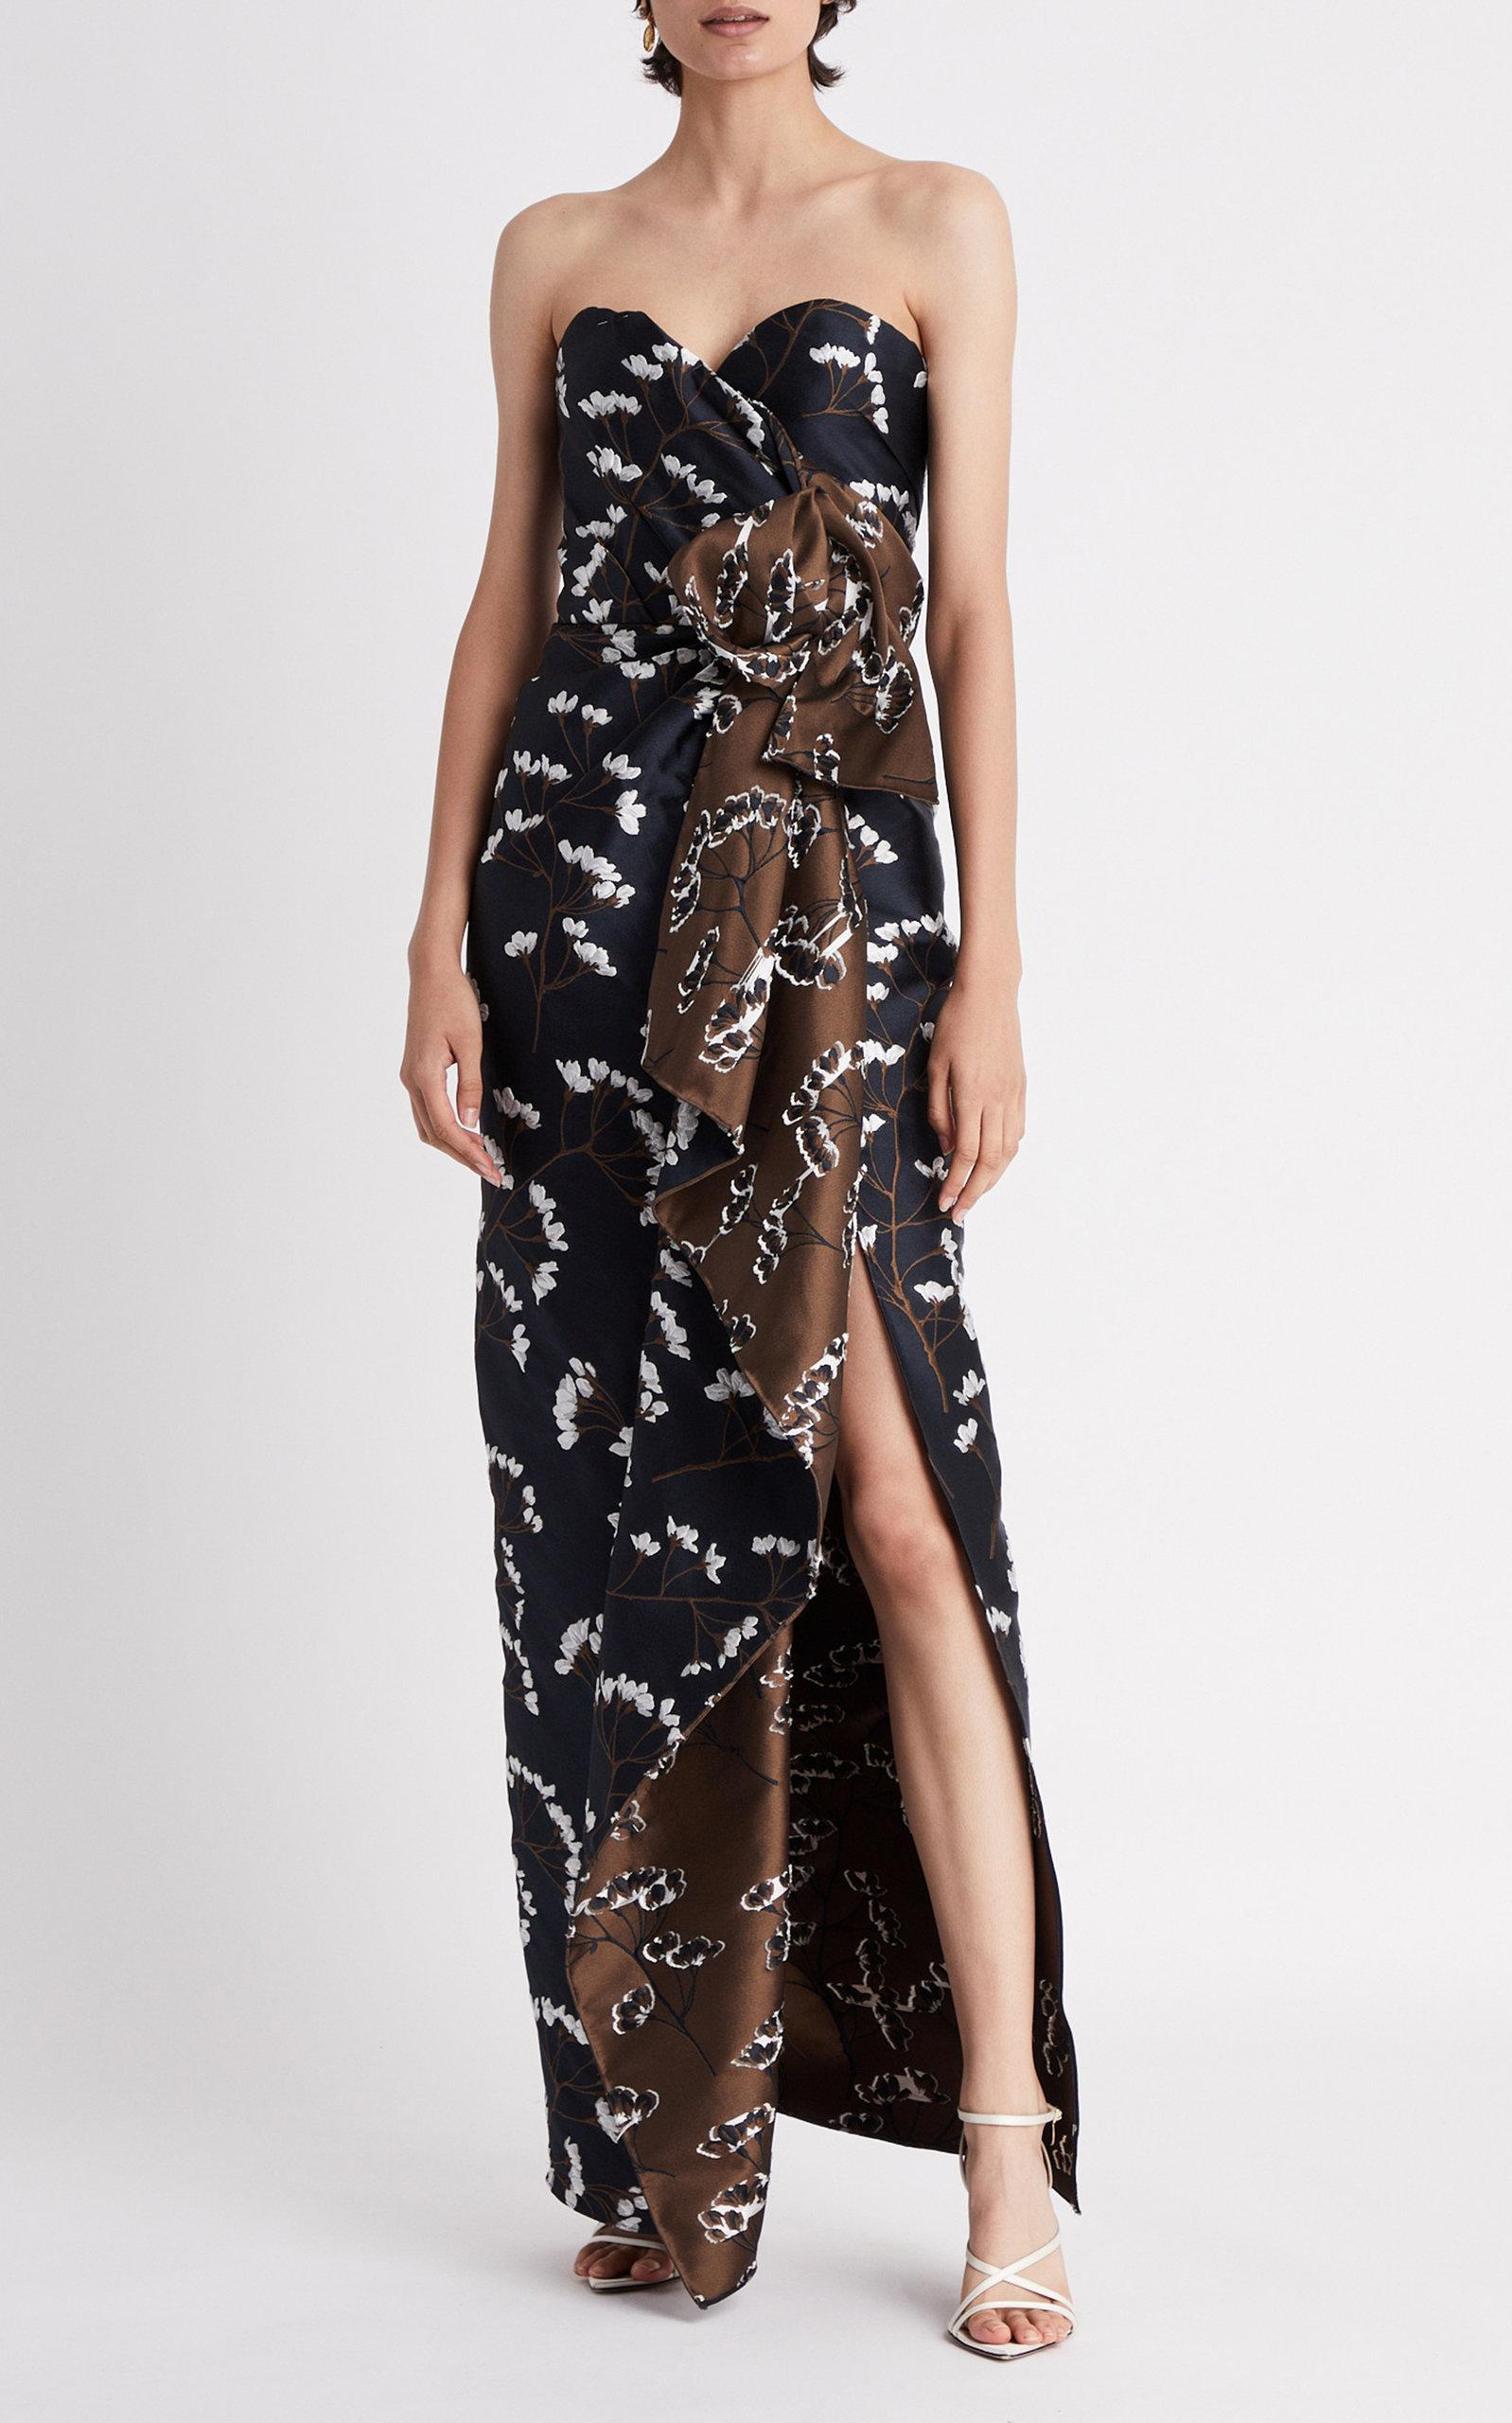 a149263e91c00 Oscar de la Renta - Blue Neck & Waist Bow Column Dress - Lyst. View  fullscreen